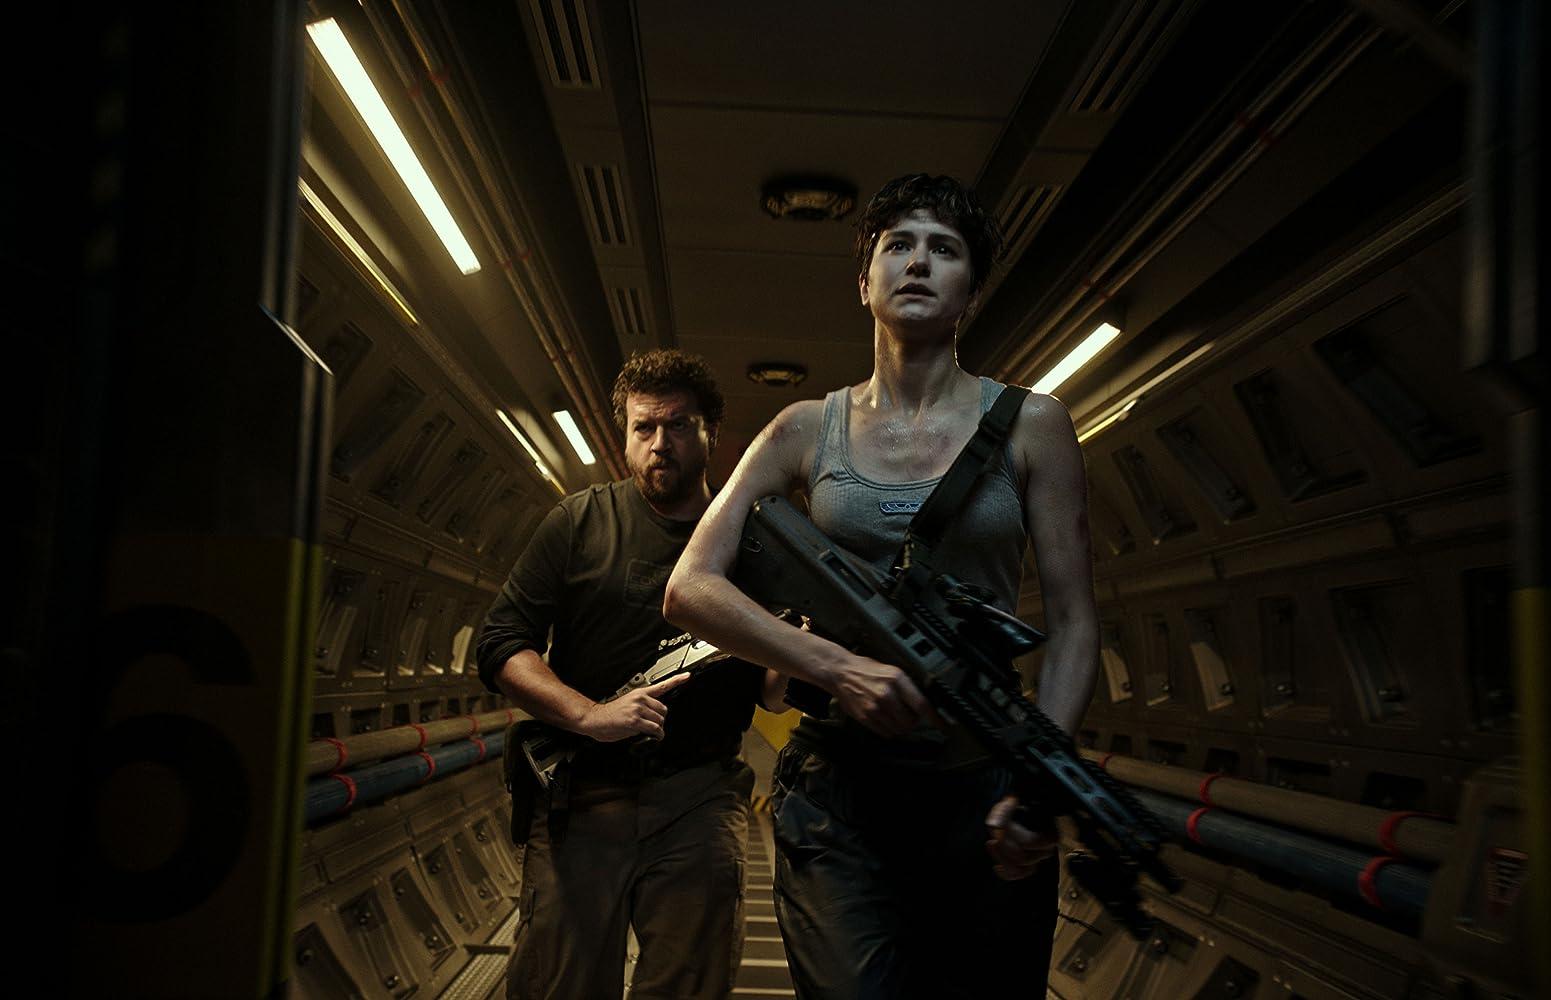 Danny McBride and Katherine Waterston in Alien: Covenant (2017)